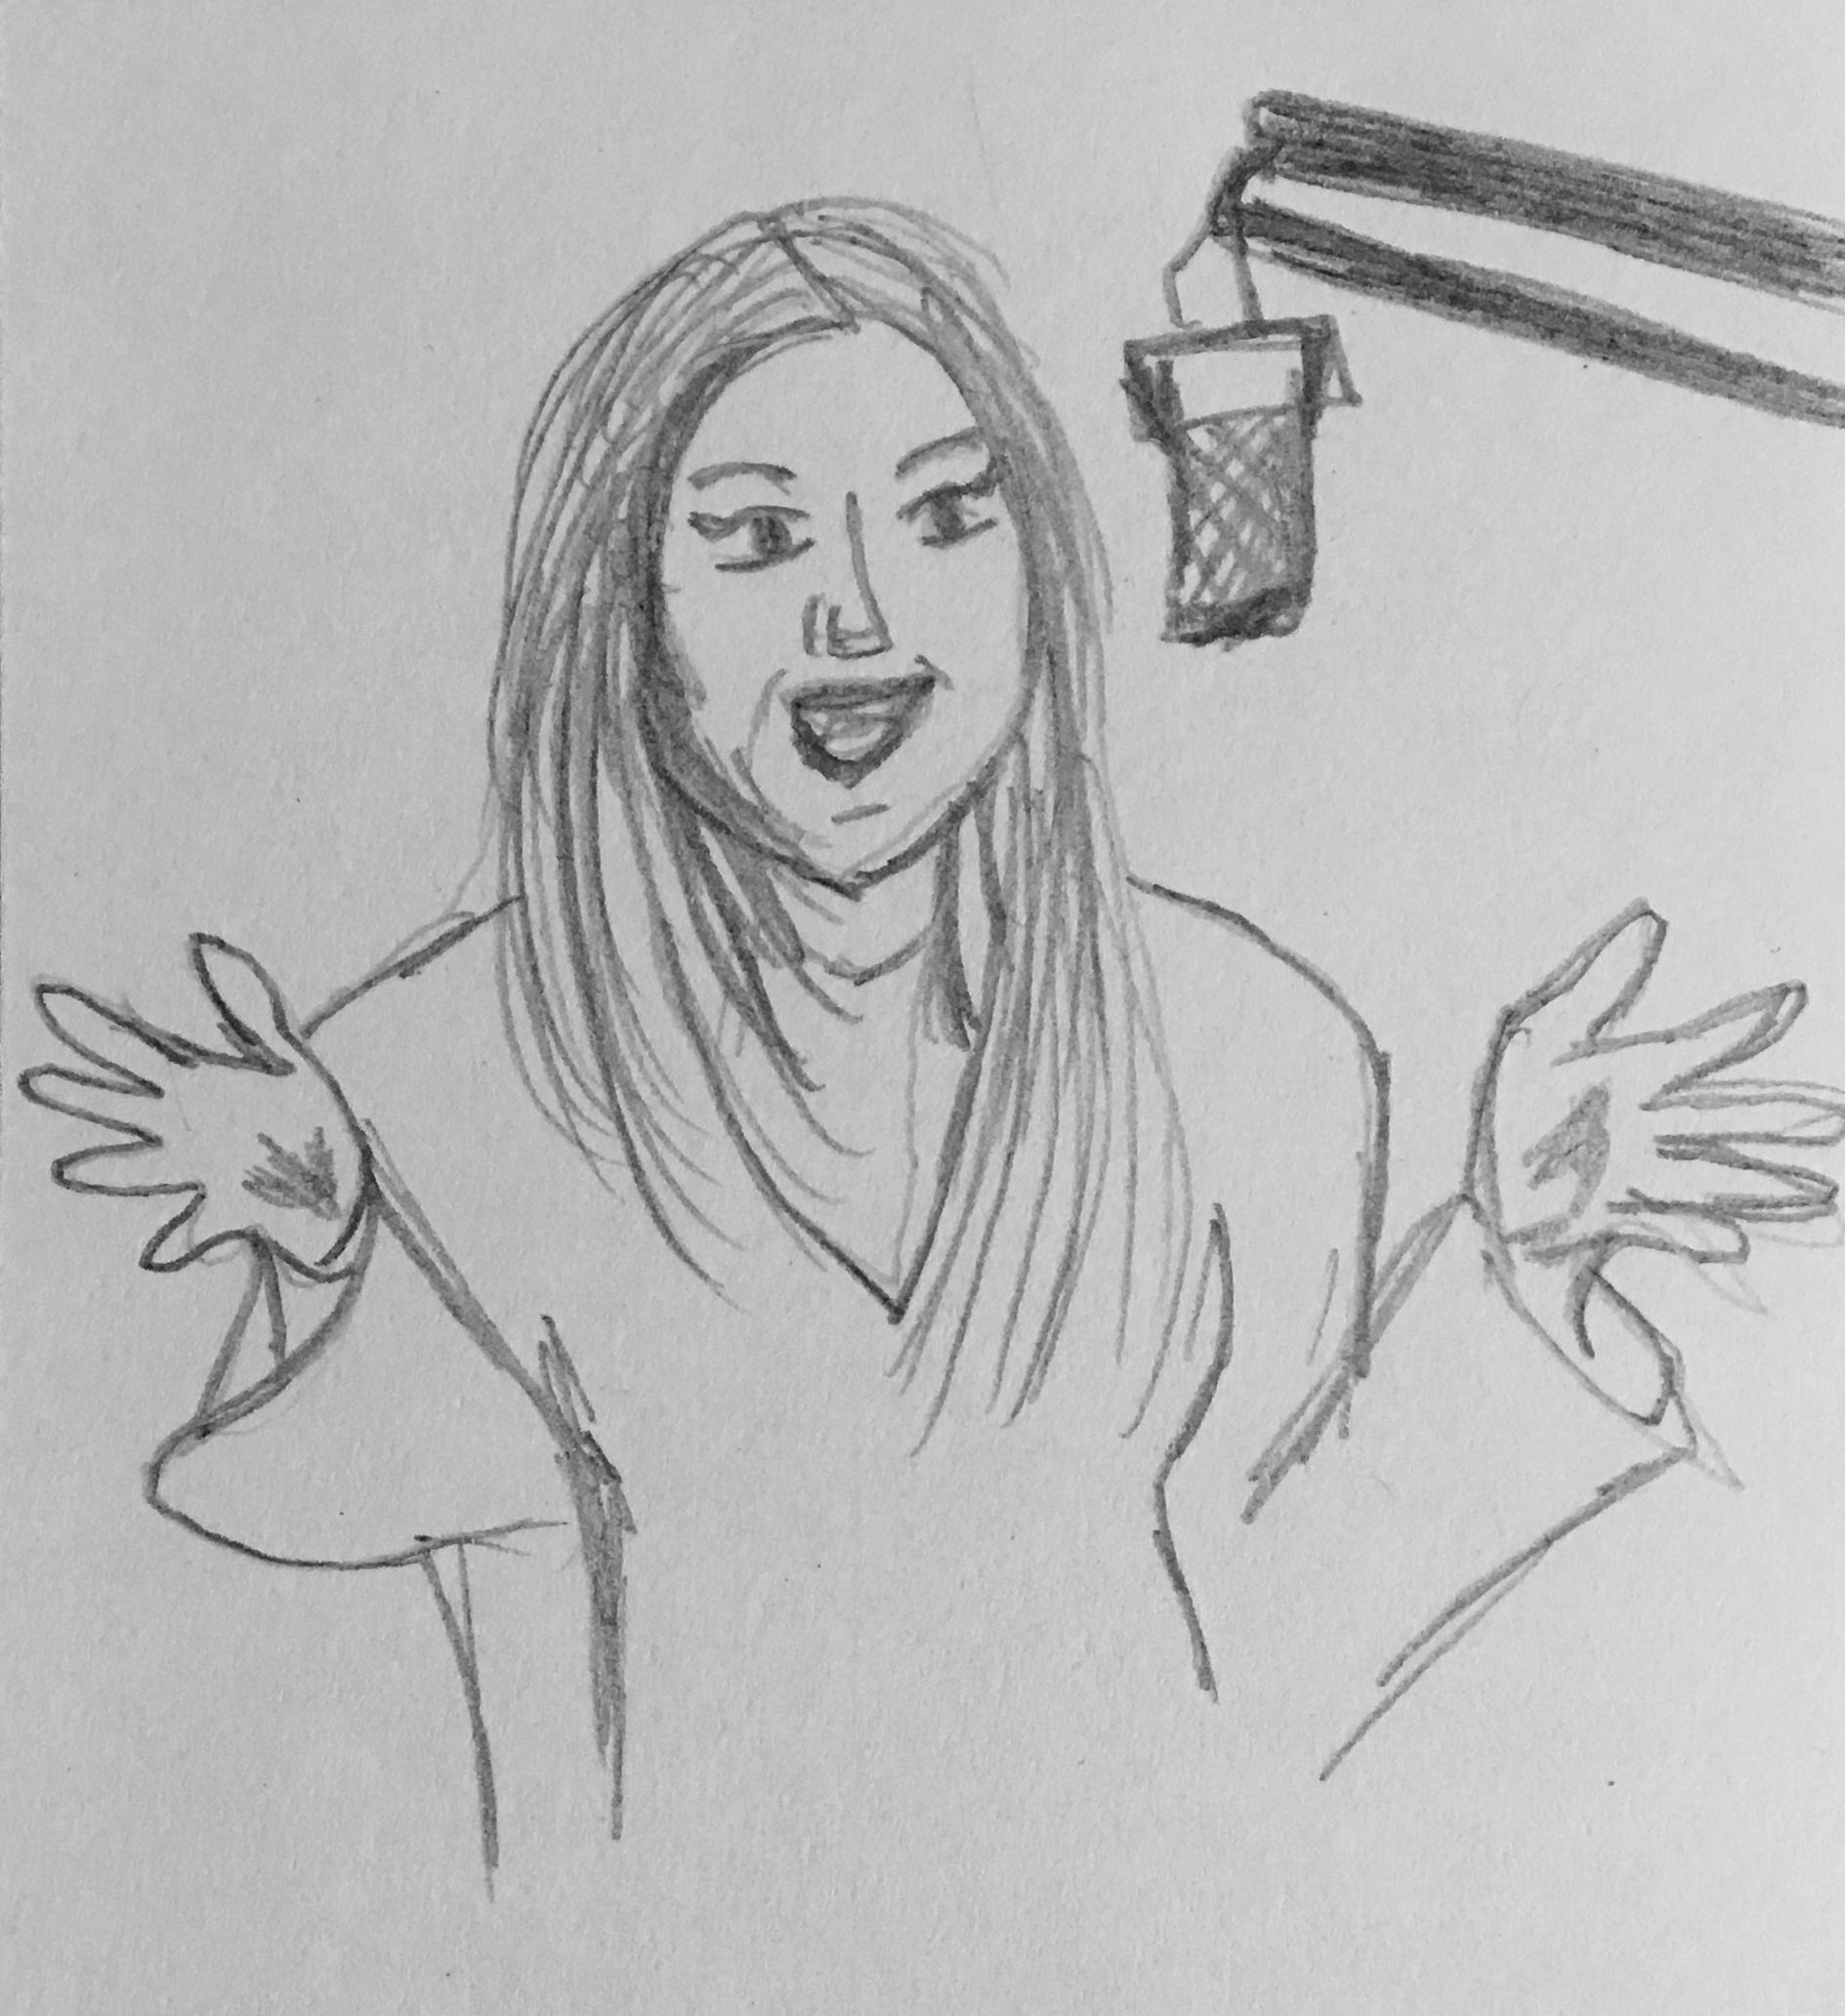 Initial sketch of Ashanti Hepzen